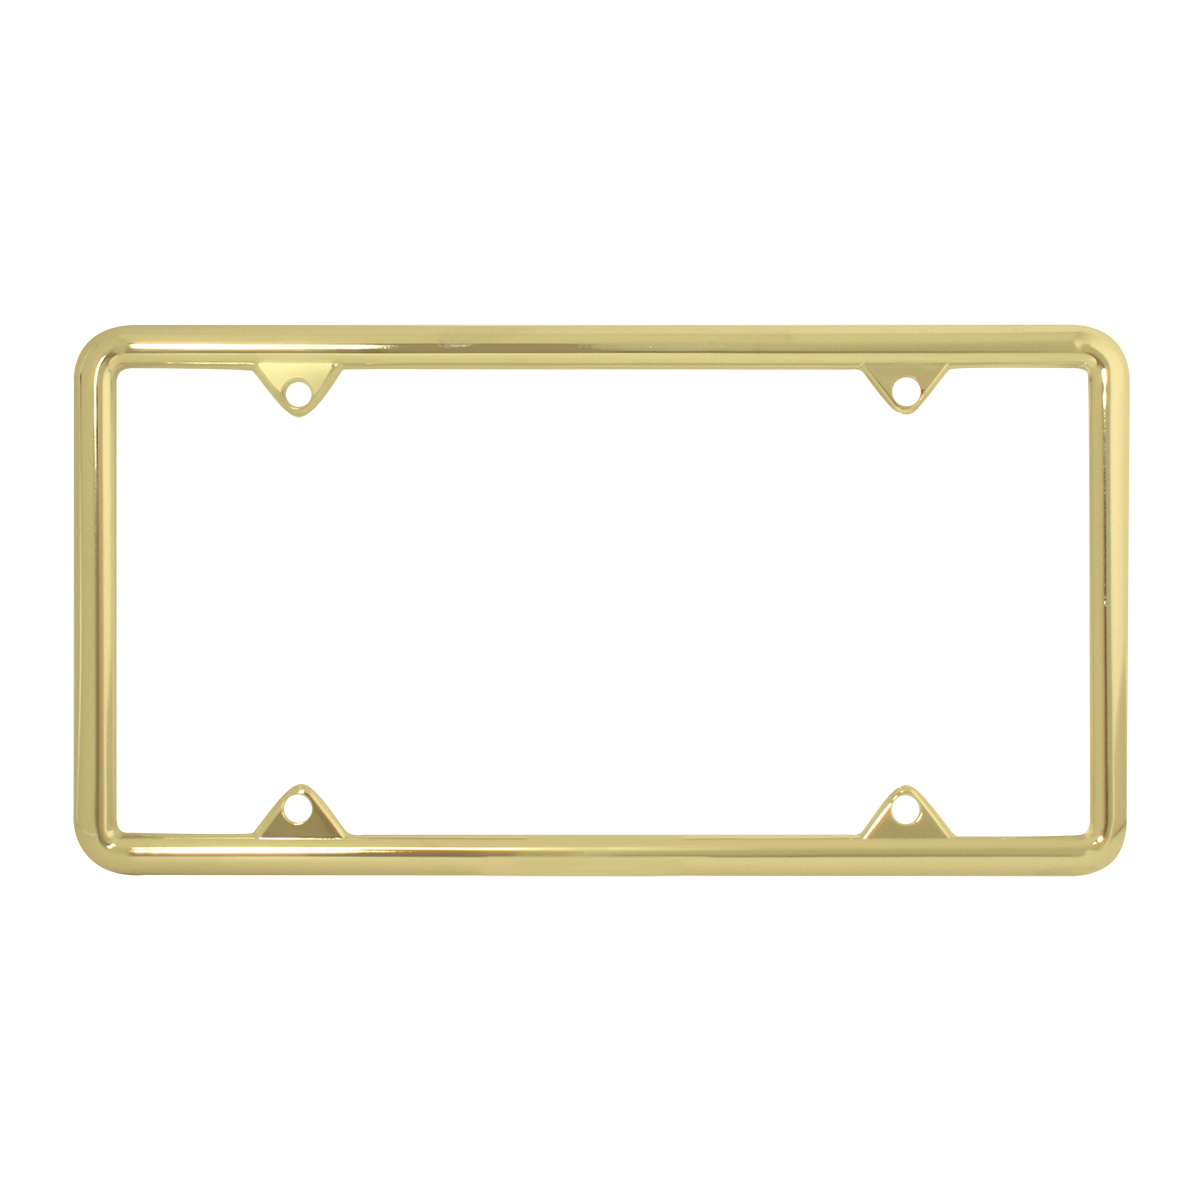 60062 Economic Brass-Plated Zinc Classic 4-Hole License Plate Frames